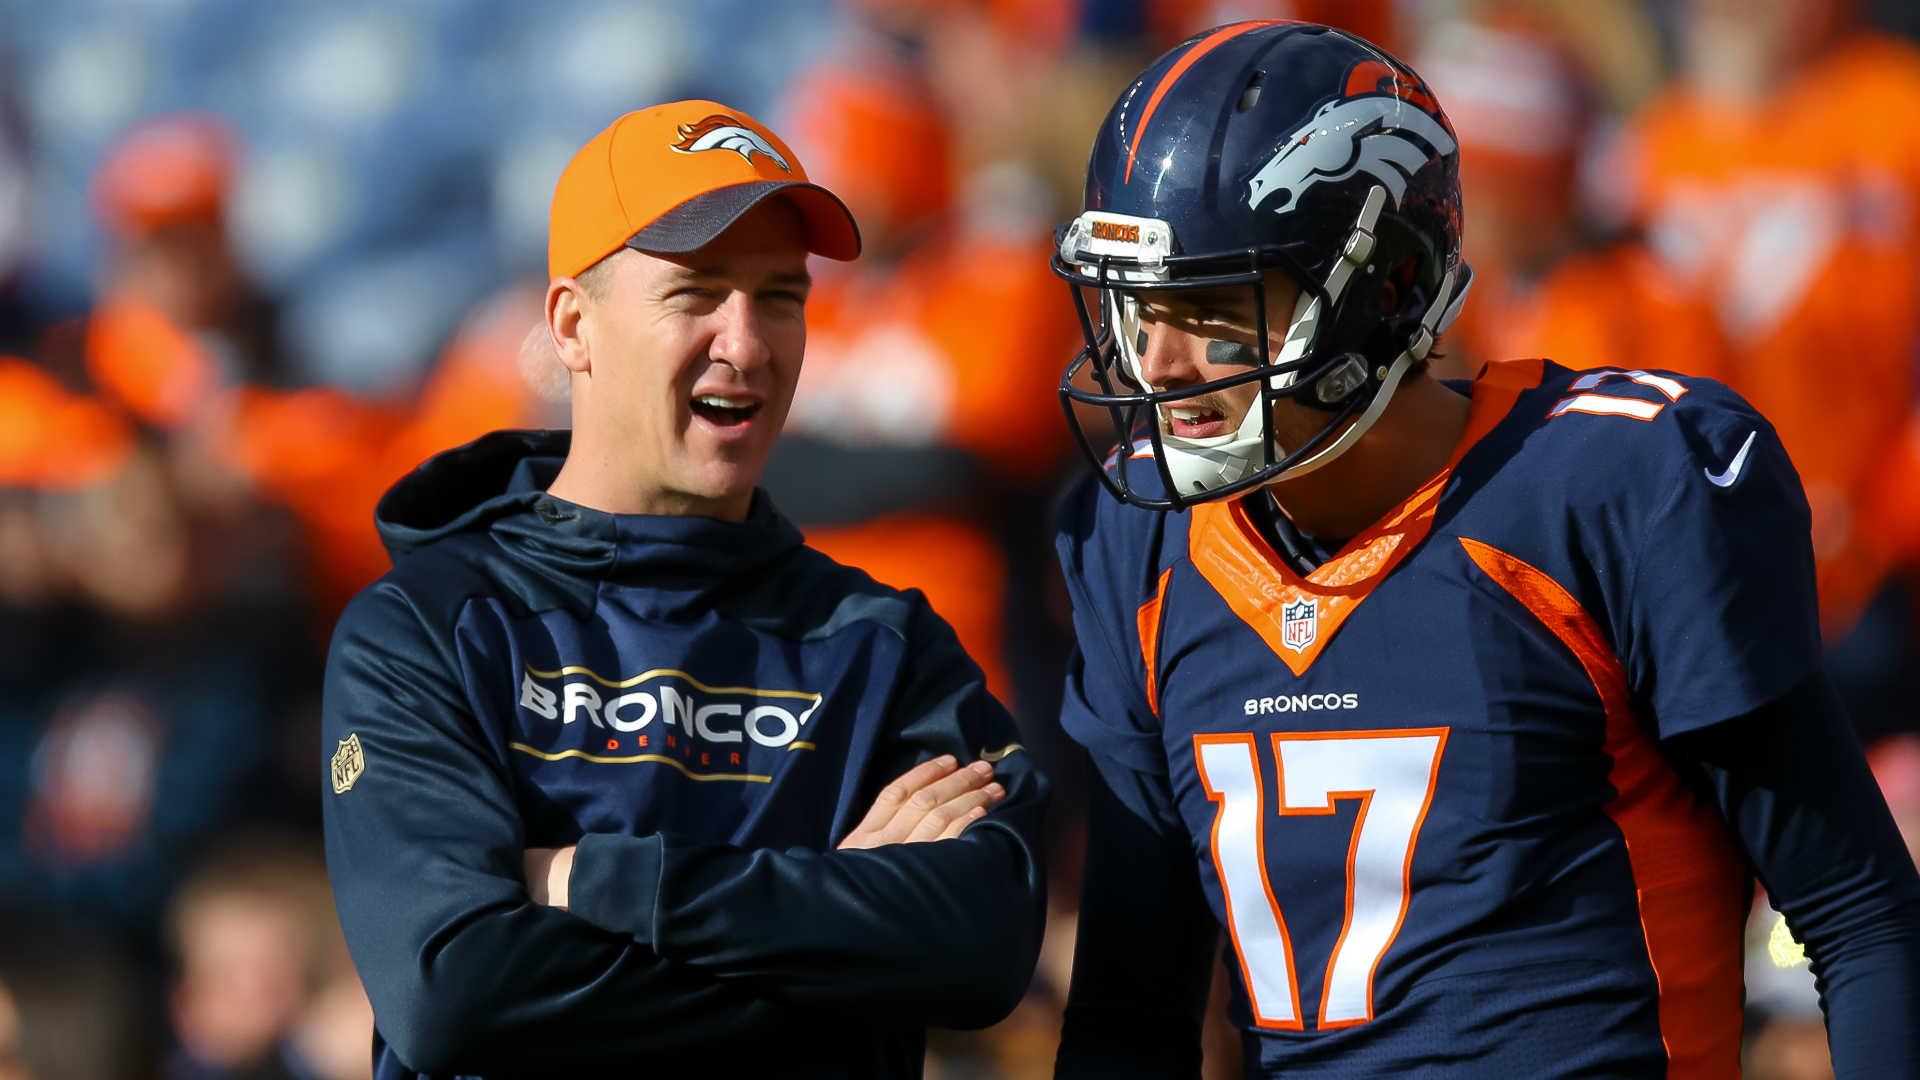 Peyton Manning and Brock Osweiler